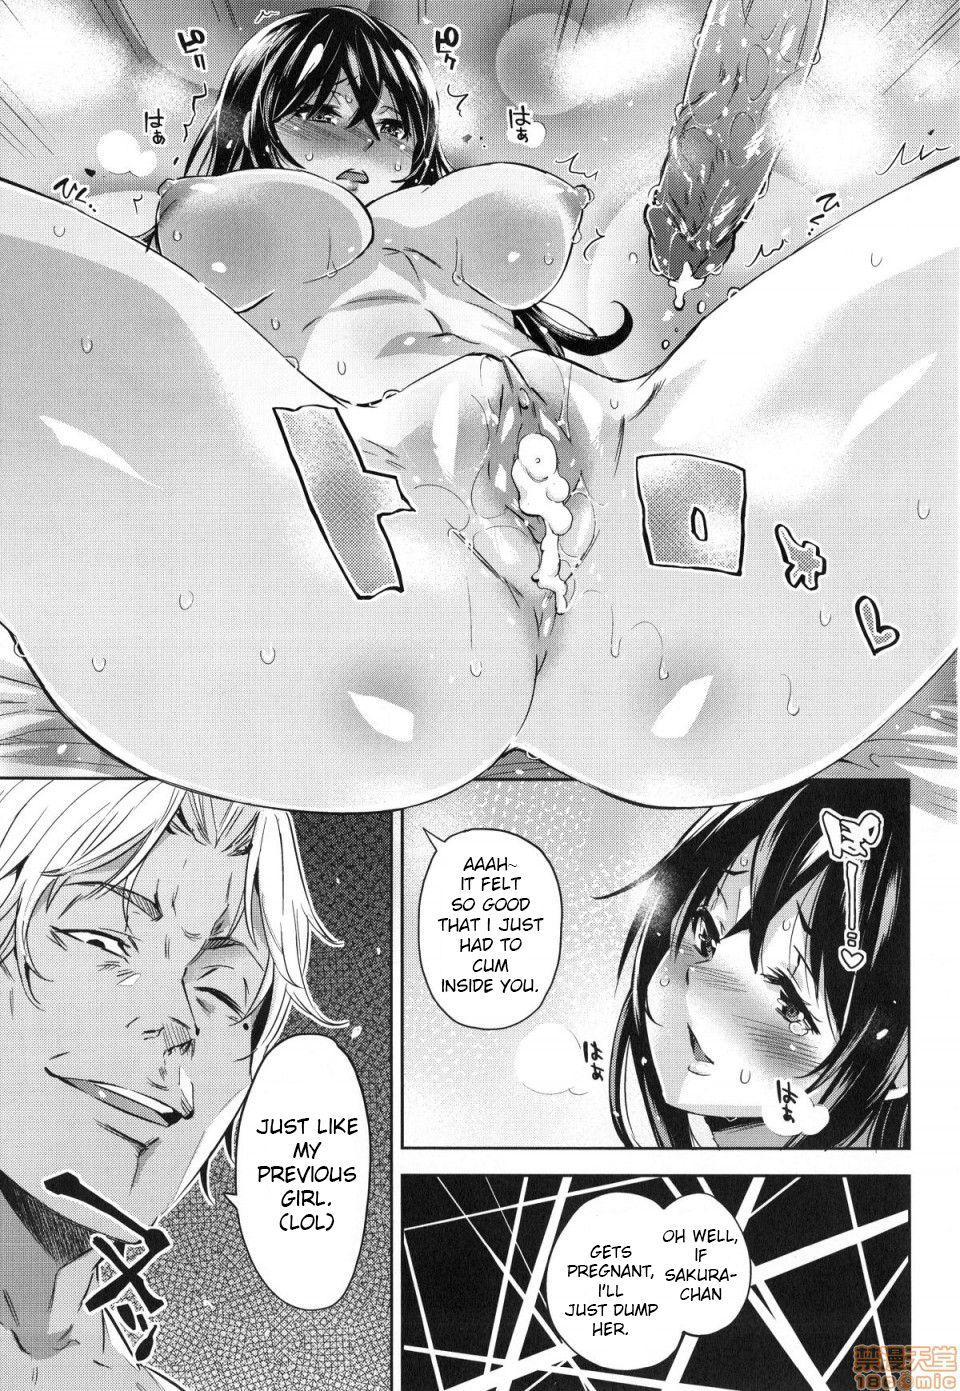 [Musenmai] Gyaru-oh Chinchin ni Katenakatta Kanojo | The Girl Who Couldn't Win Against The Gyaru-oh Dick (Ochinchin ni Makete shimatta Onnanoko-tachi) [English] [Decensored] 6